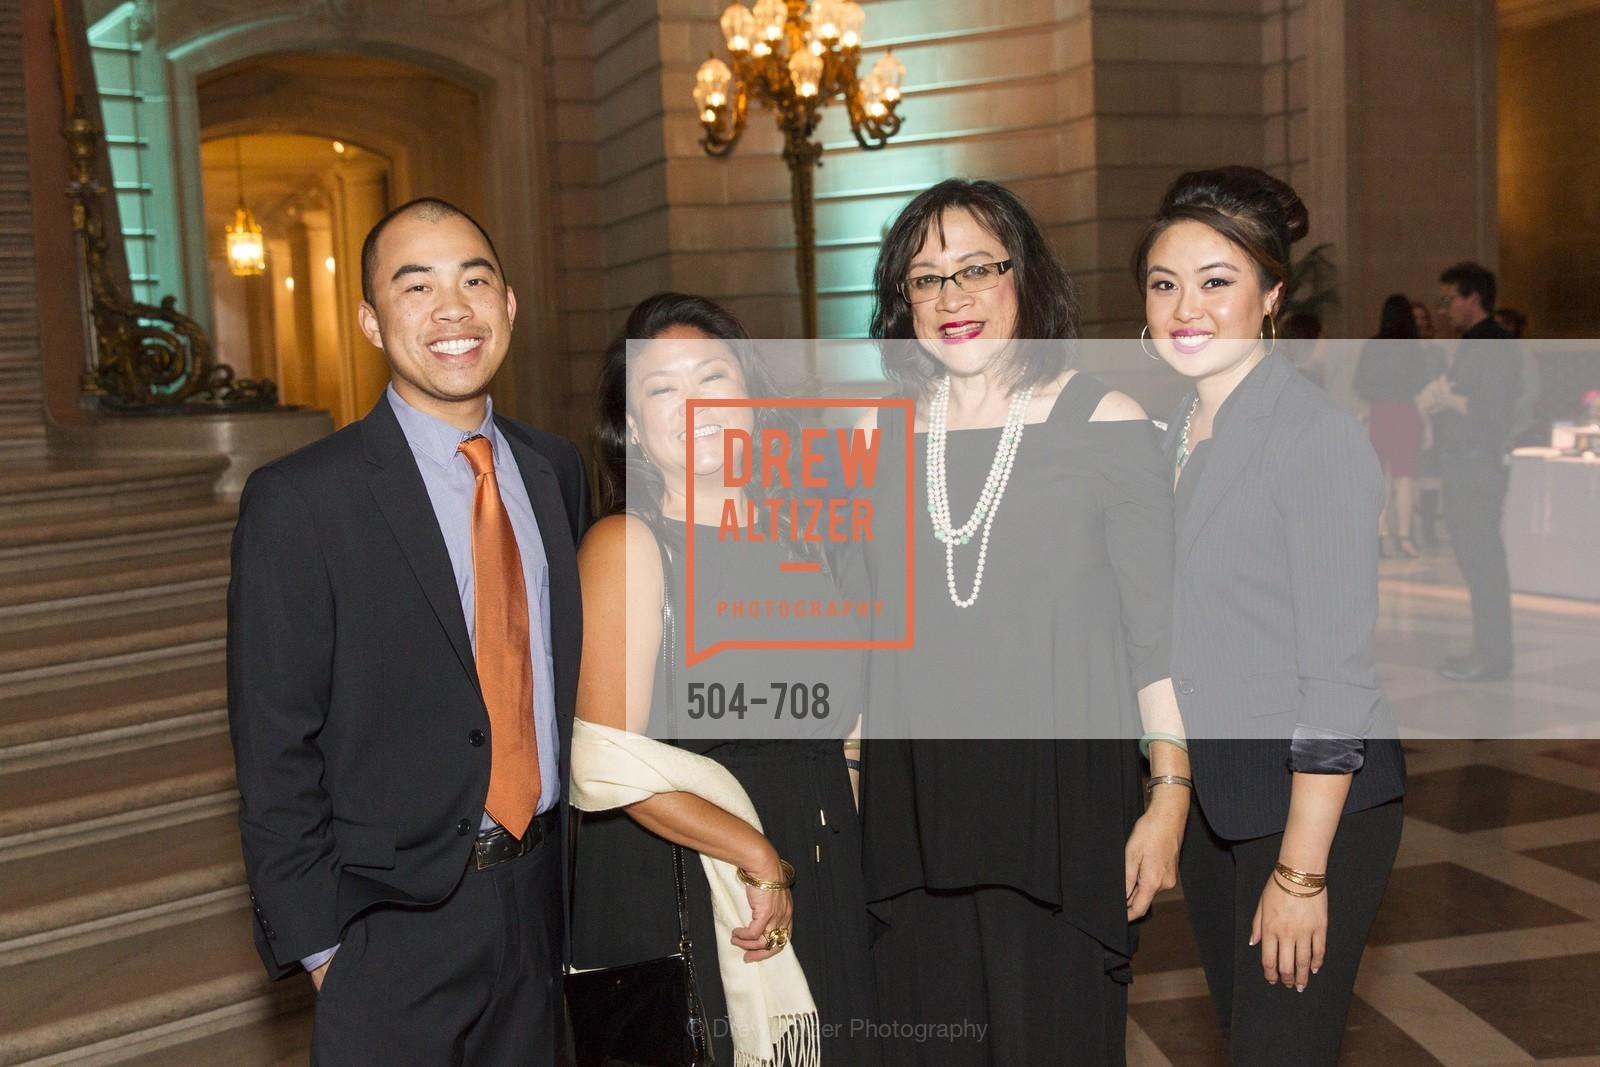 Spencer Lew, Sheryl Koga, Roberta Lew, Stephanie Nguyen, PROJECT OPEN HAND Gala